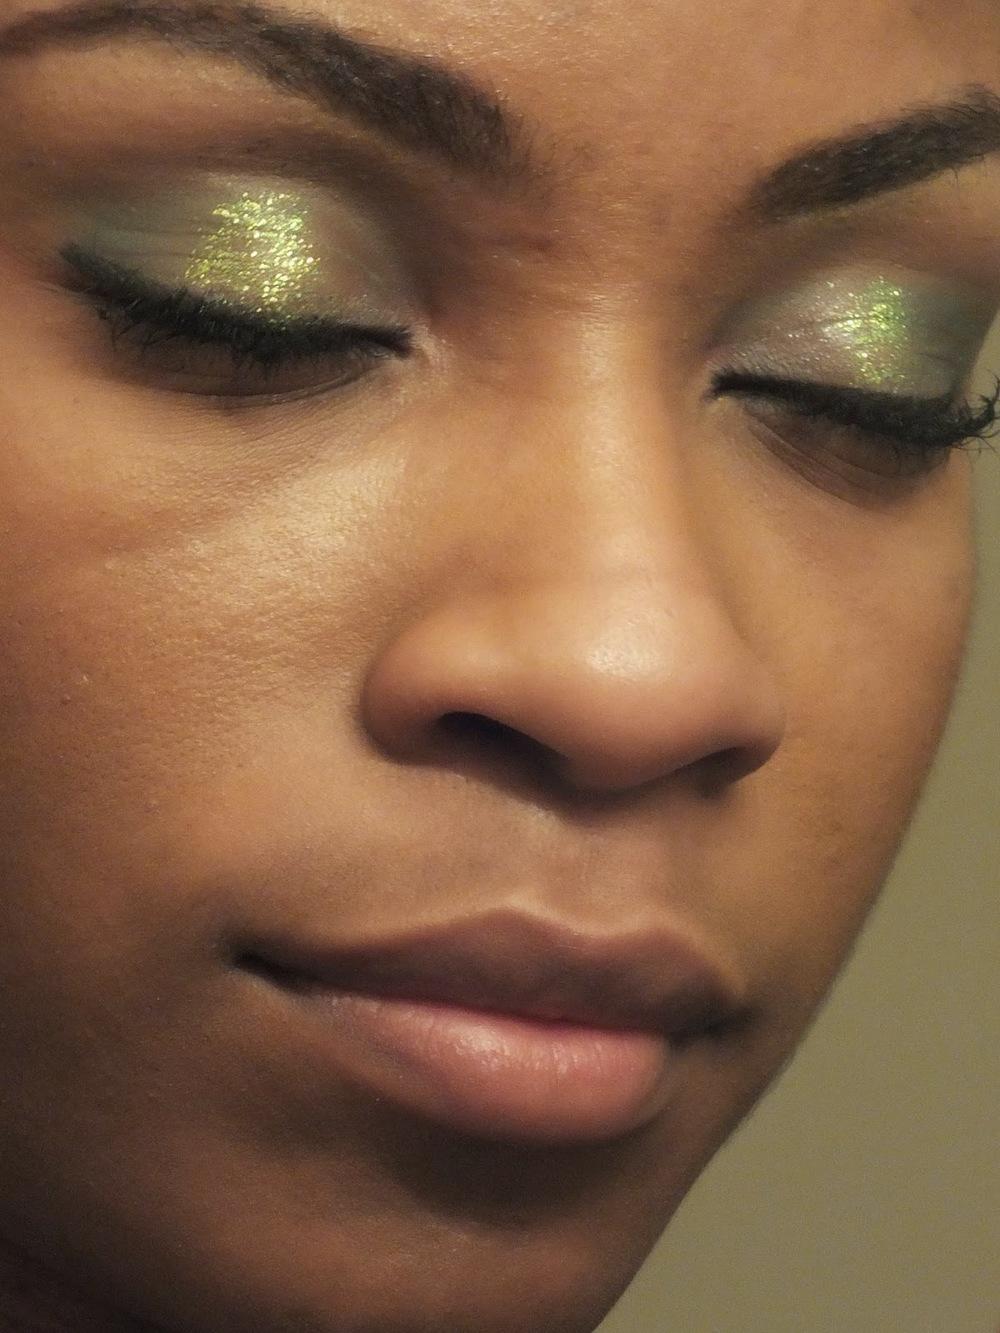 green+shimmer+eyeshadow.JPG